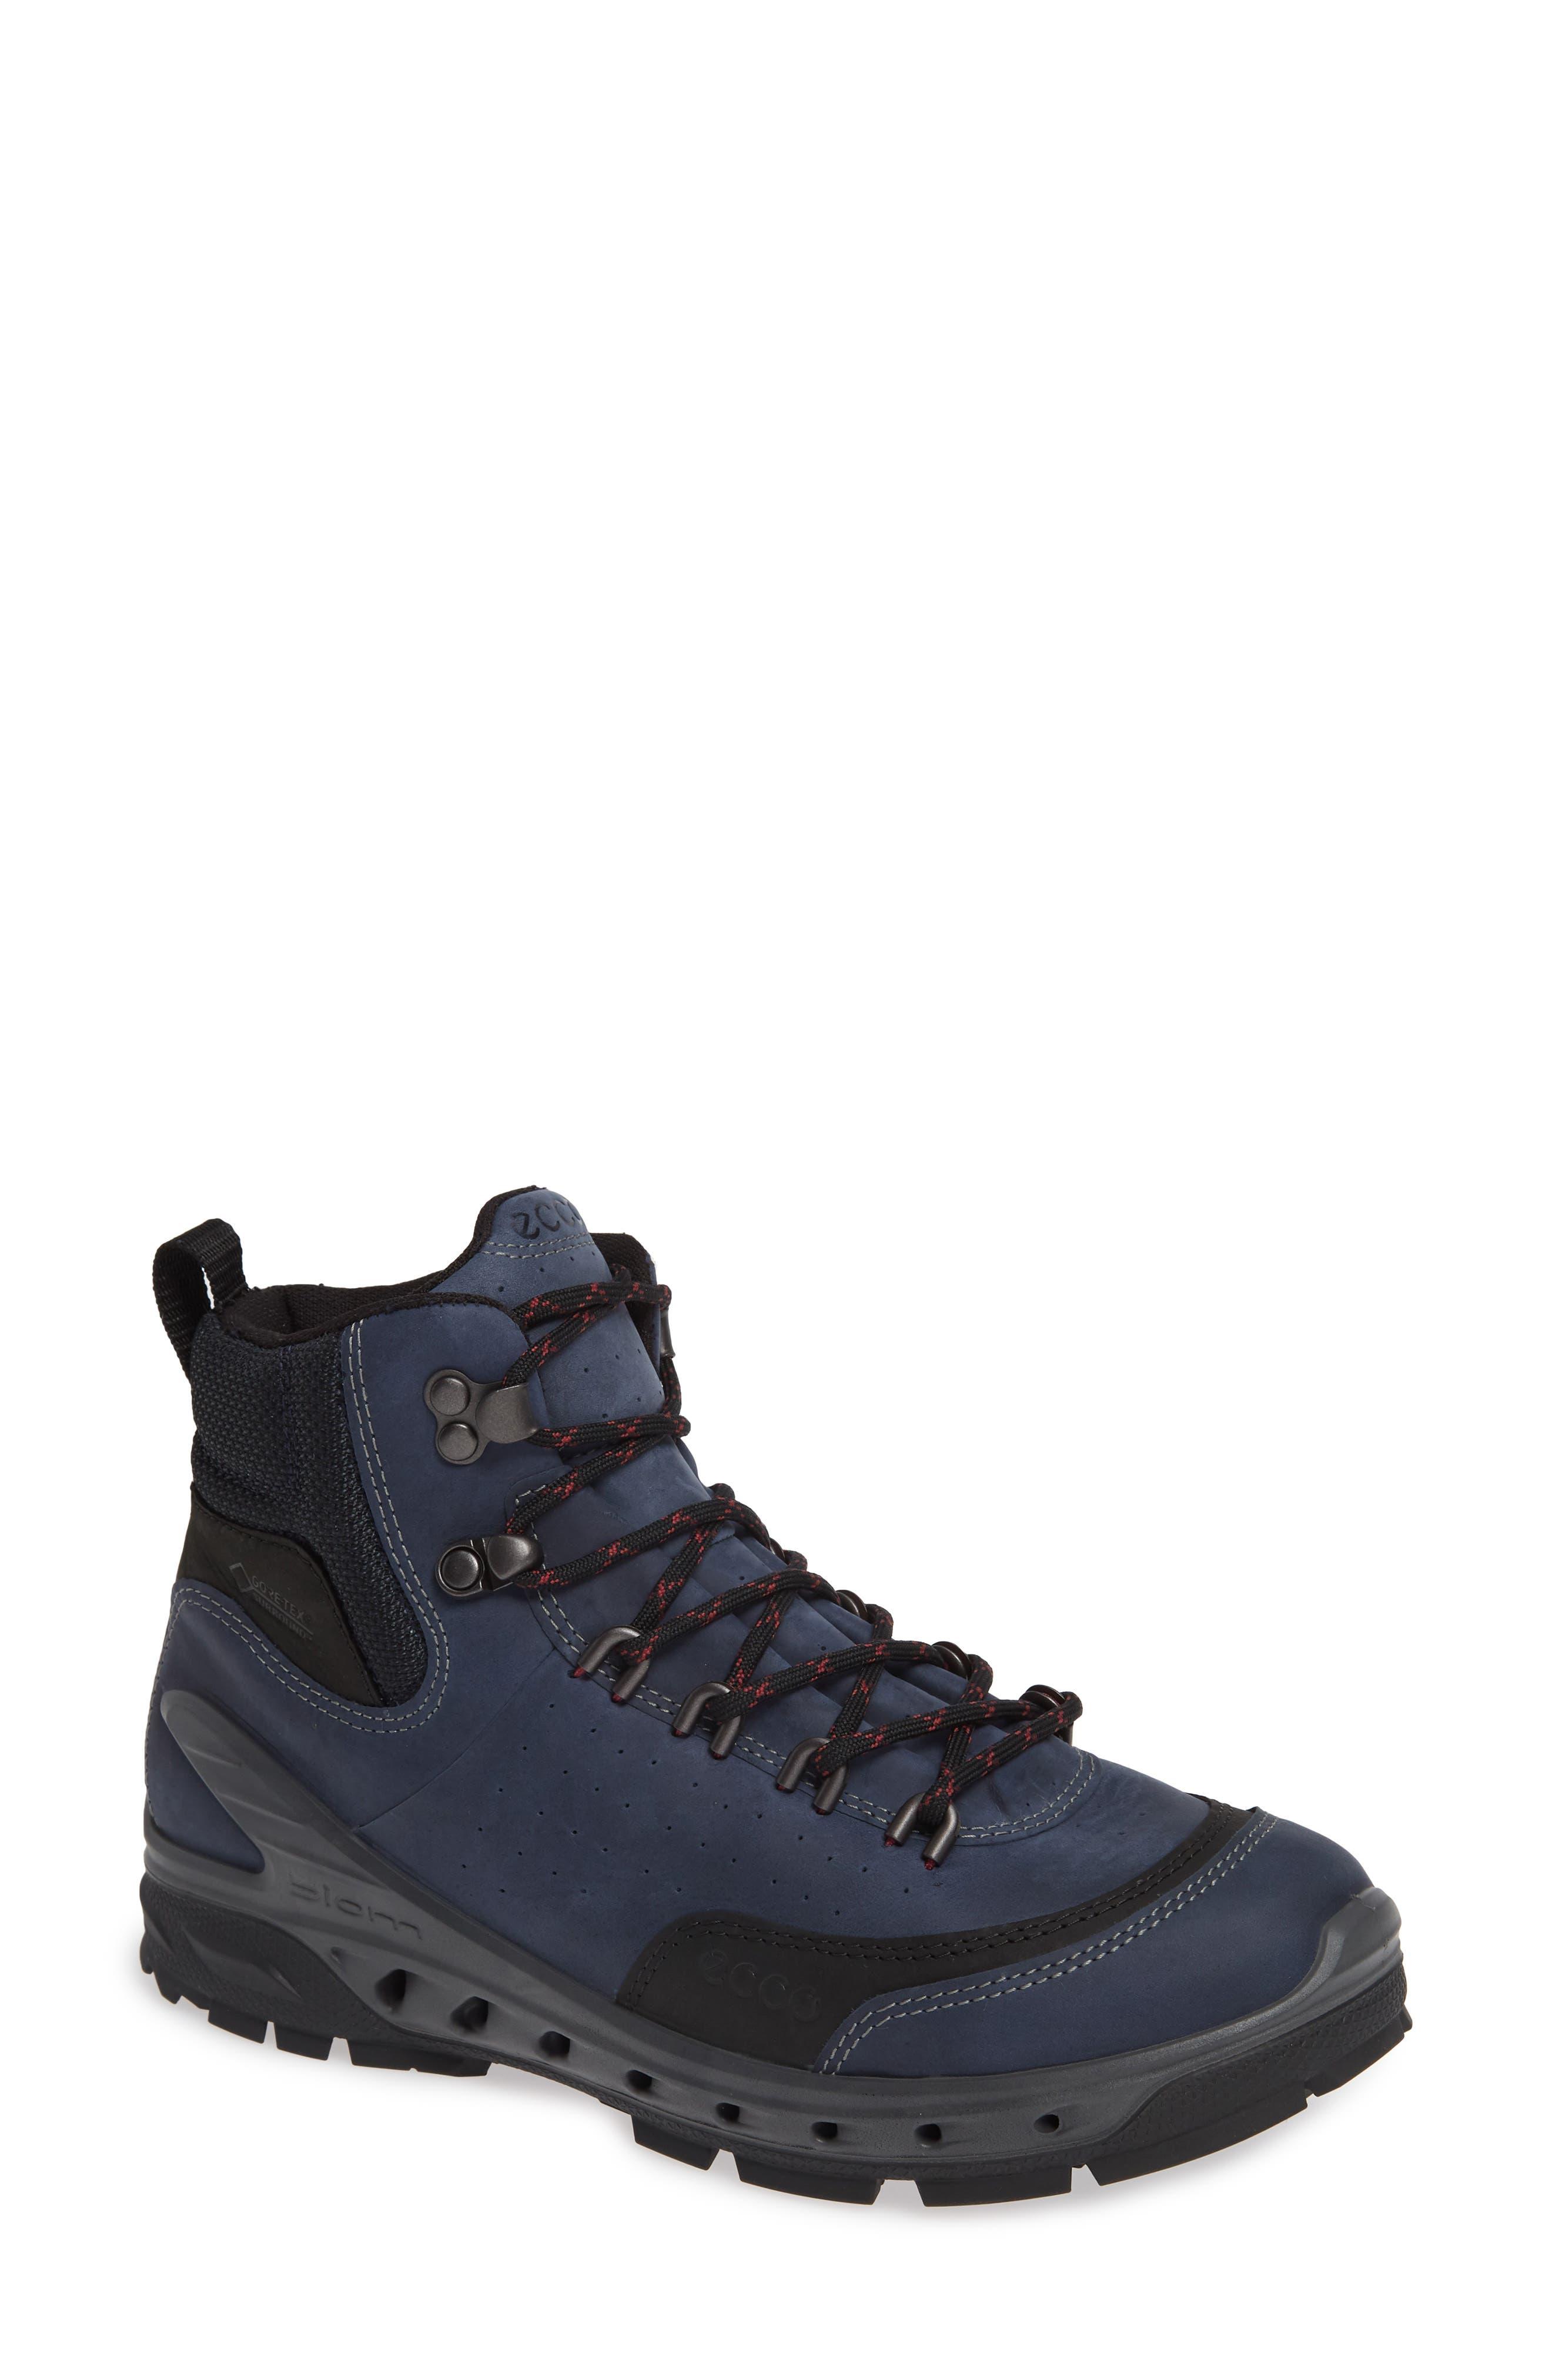 Ecco Biom Gtx Venture Tr Boot, Blue